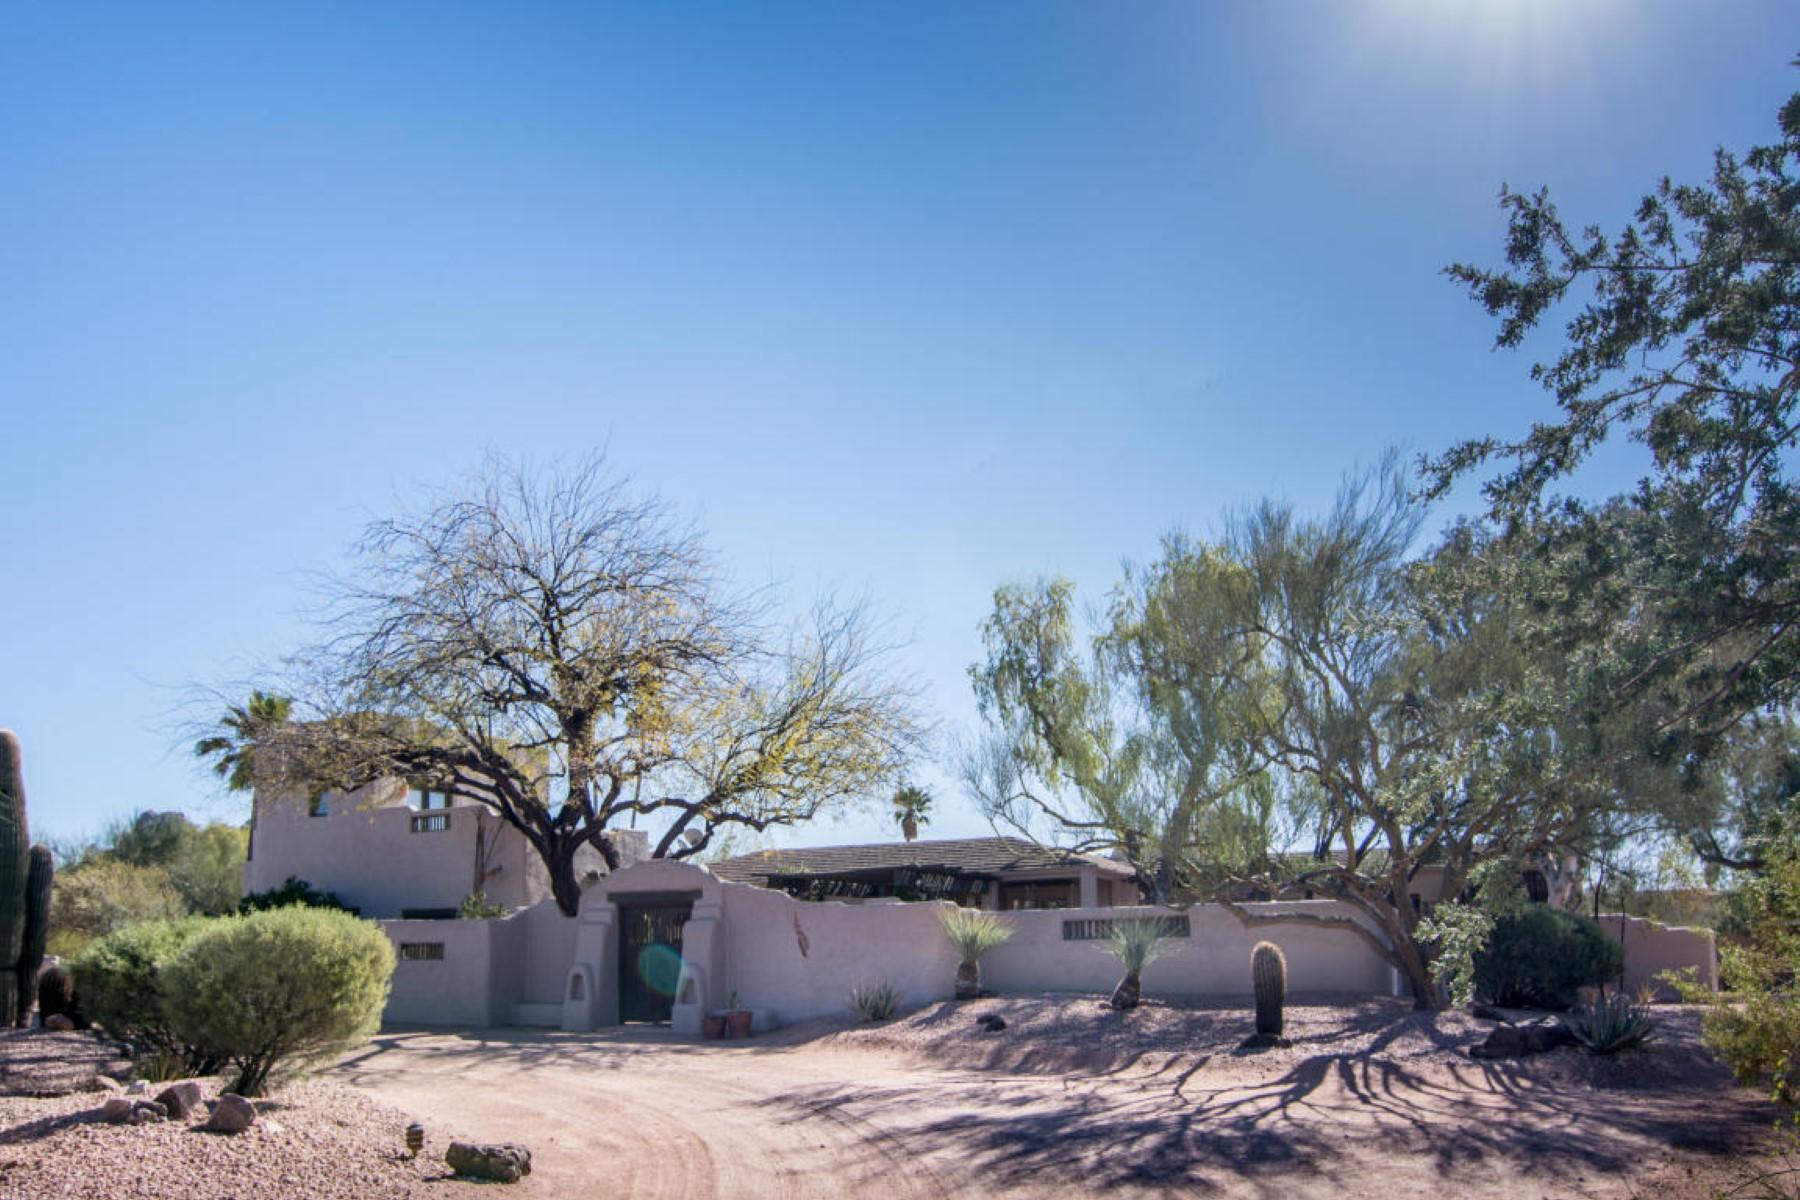 獨棟家庭住宅 為 出售 在 A unique home is an artistic jewel in desert with soul 3653 E Camino Sin Nombre Paradise Valley, 亞利桑那州, 85253 美國